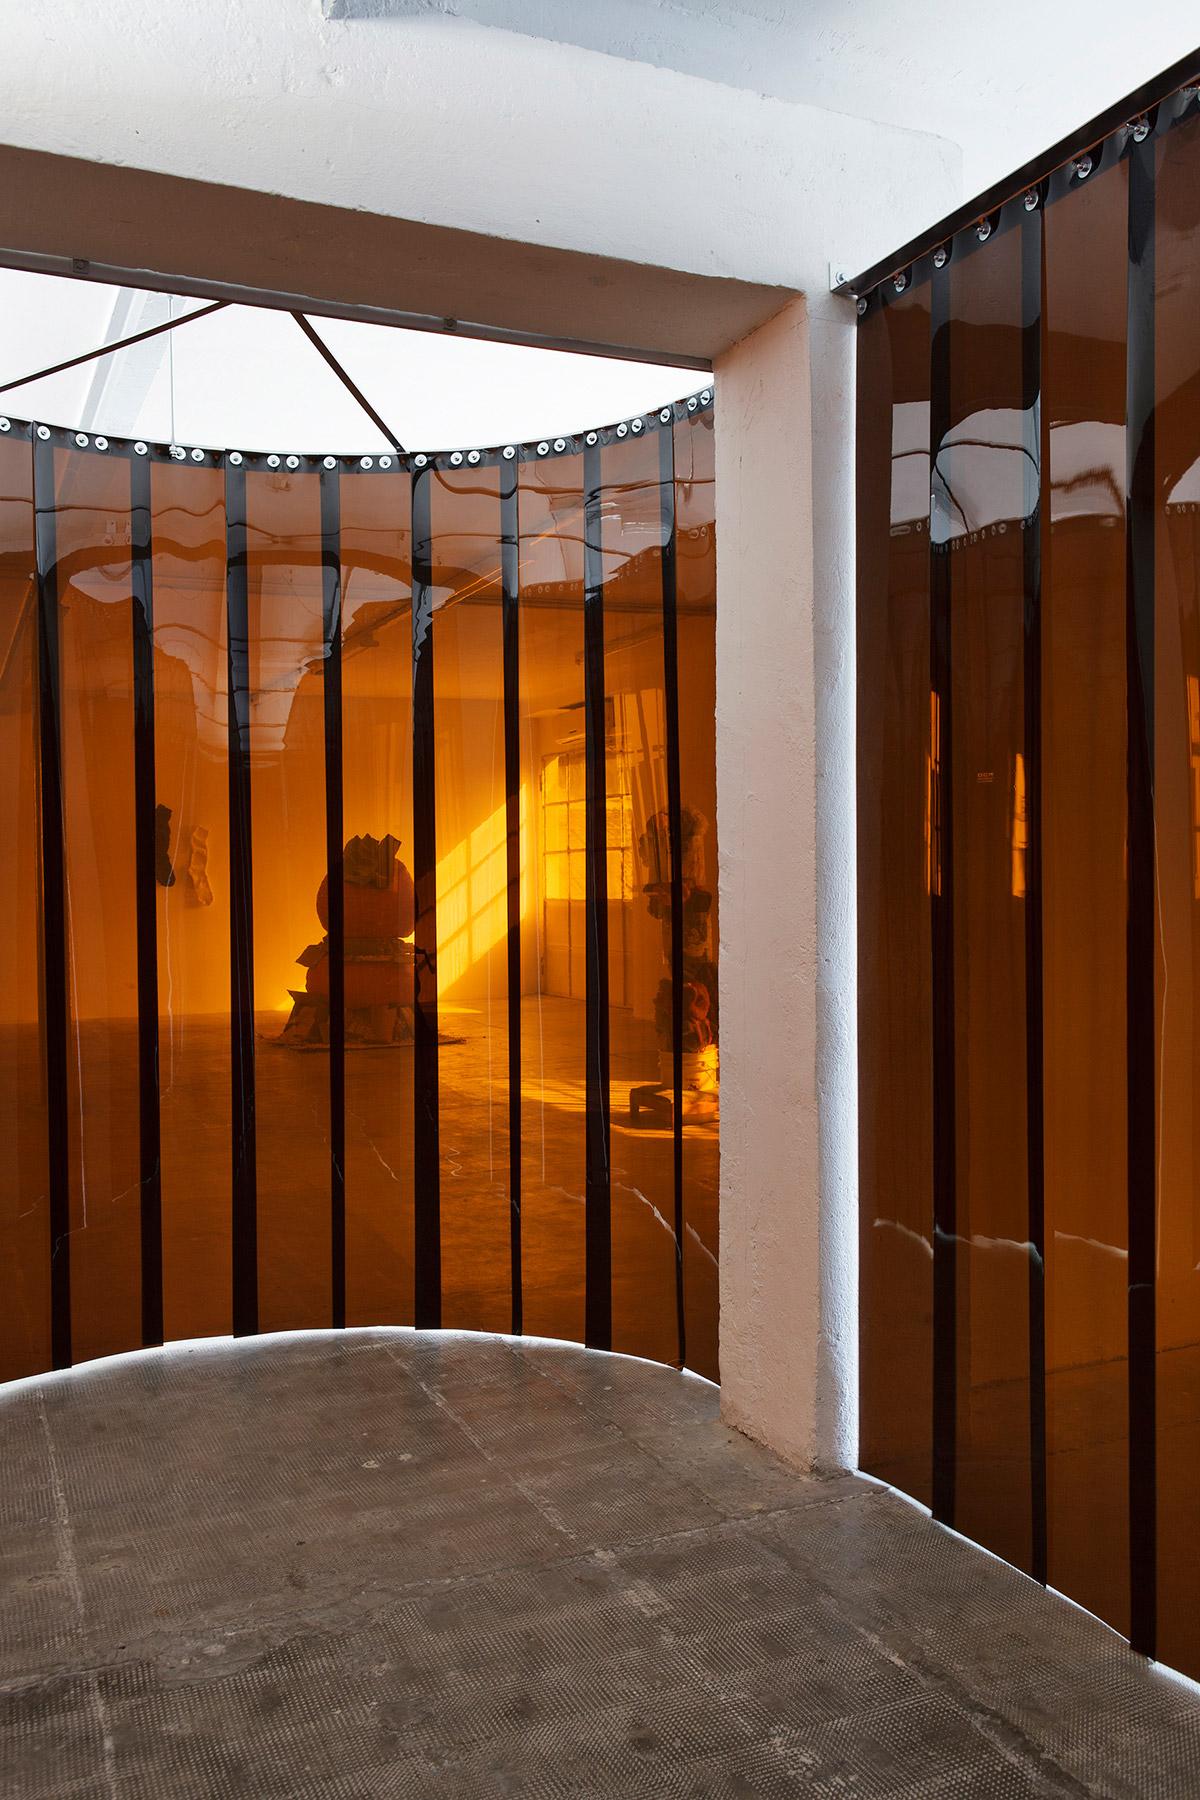 Catharine Ahearn, installation view at Peep-Hole 2015 Ph Laura Fantacuzzi